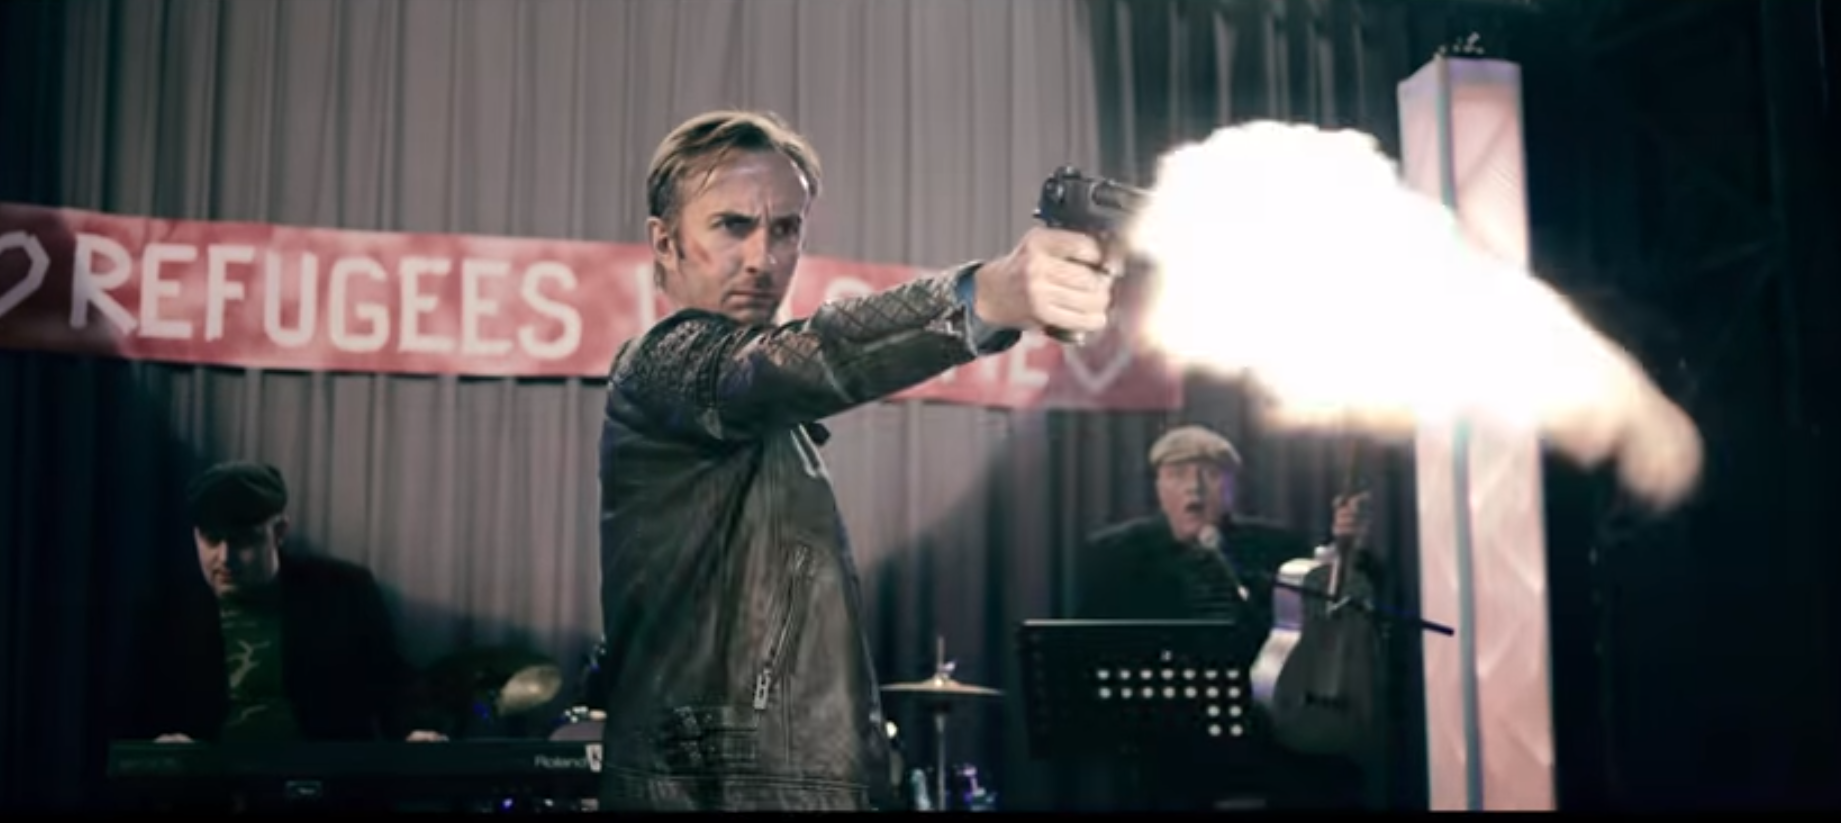 Im neuen Tatort-Trailer: Jan Böhmermann als Nick Tschiller